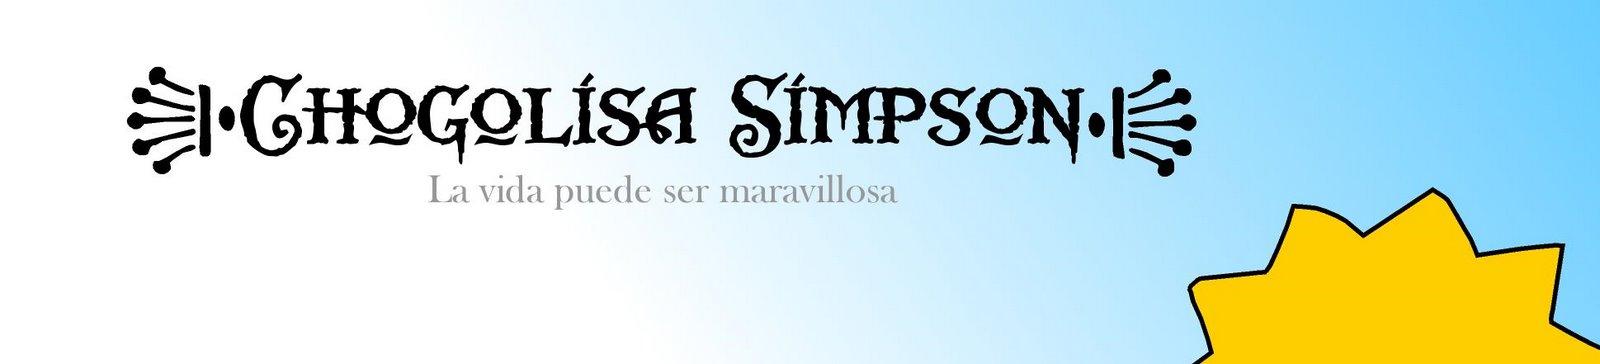 Chogolisa Simpson